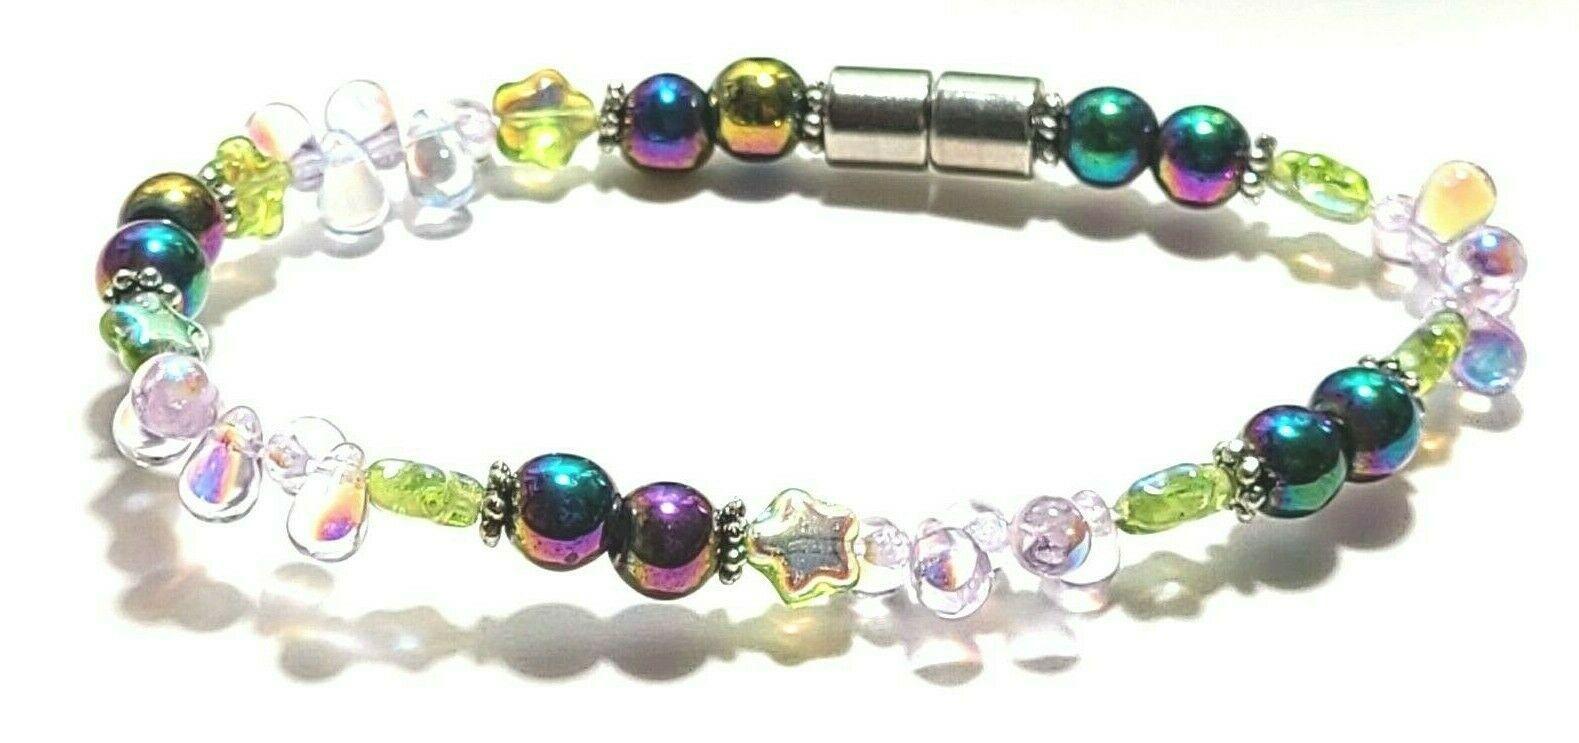 Beaded Bracelet Magnetic Hematite Clasp Single Strand   7 Inch   (MAG-018)